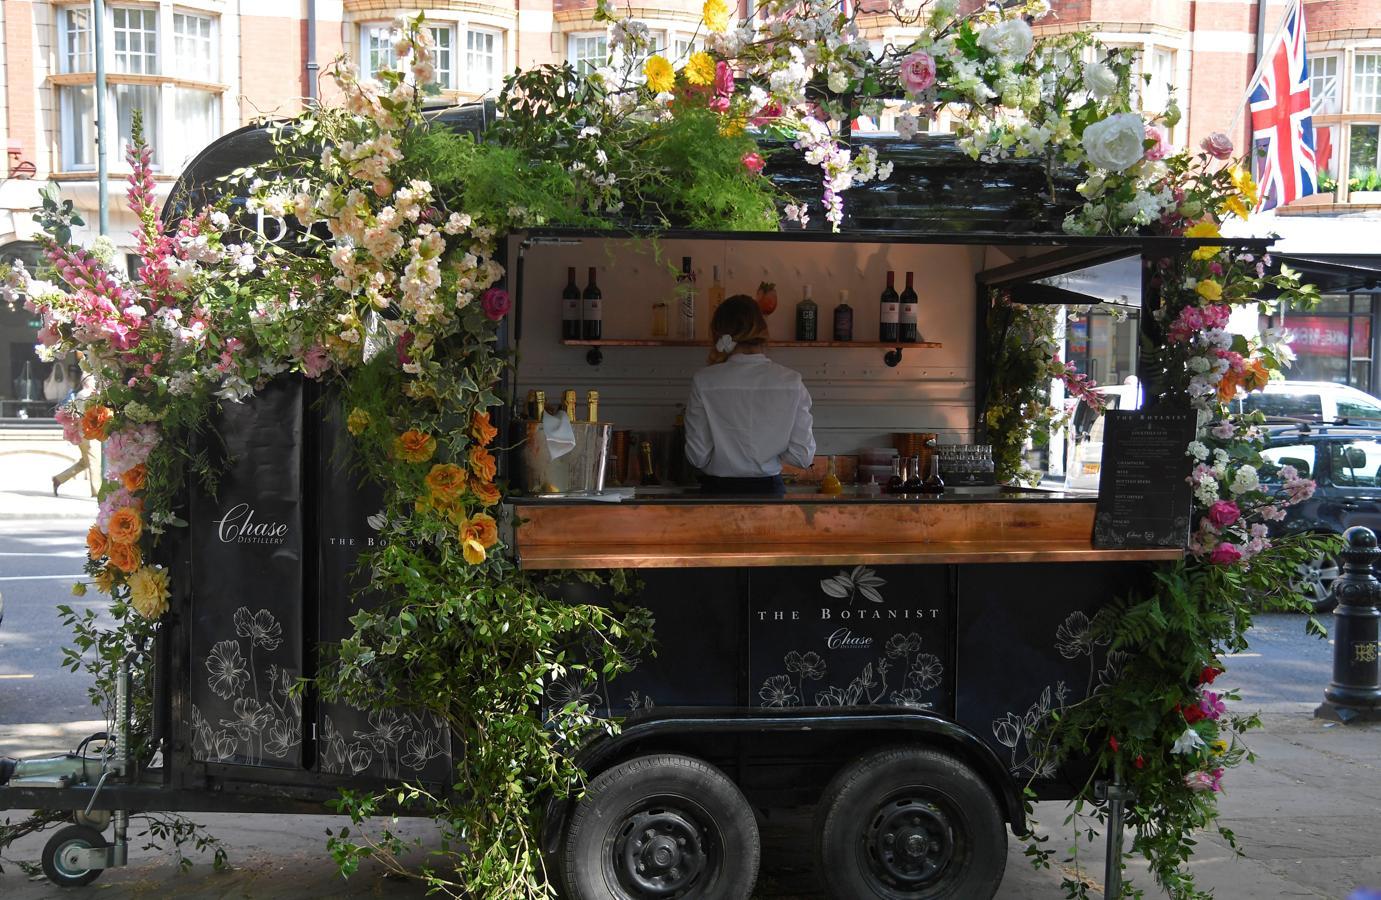 el chelsea flower show de 2018 en im genes. Black Bedroom Furniture Sets. Home Design Ideas